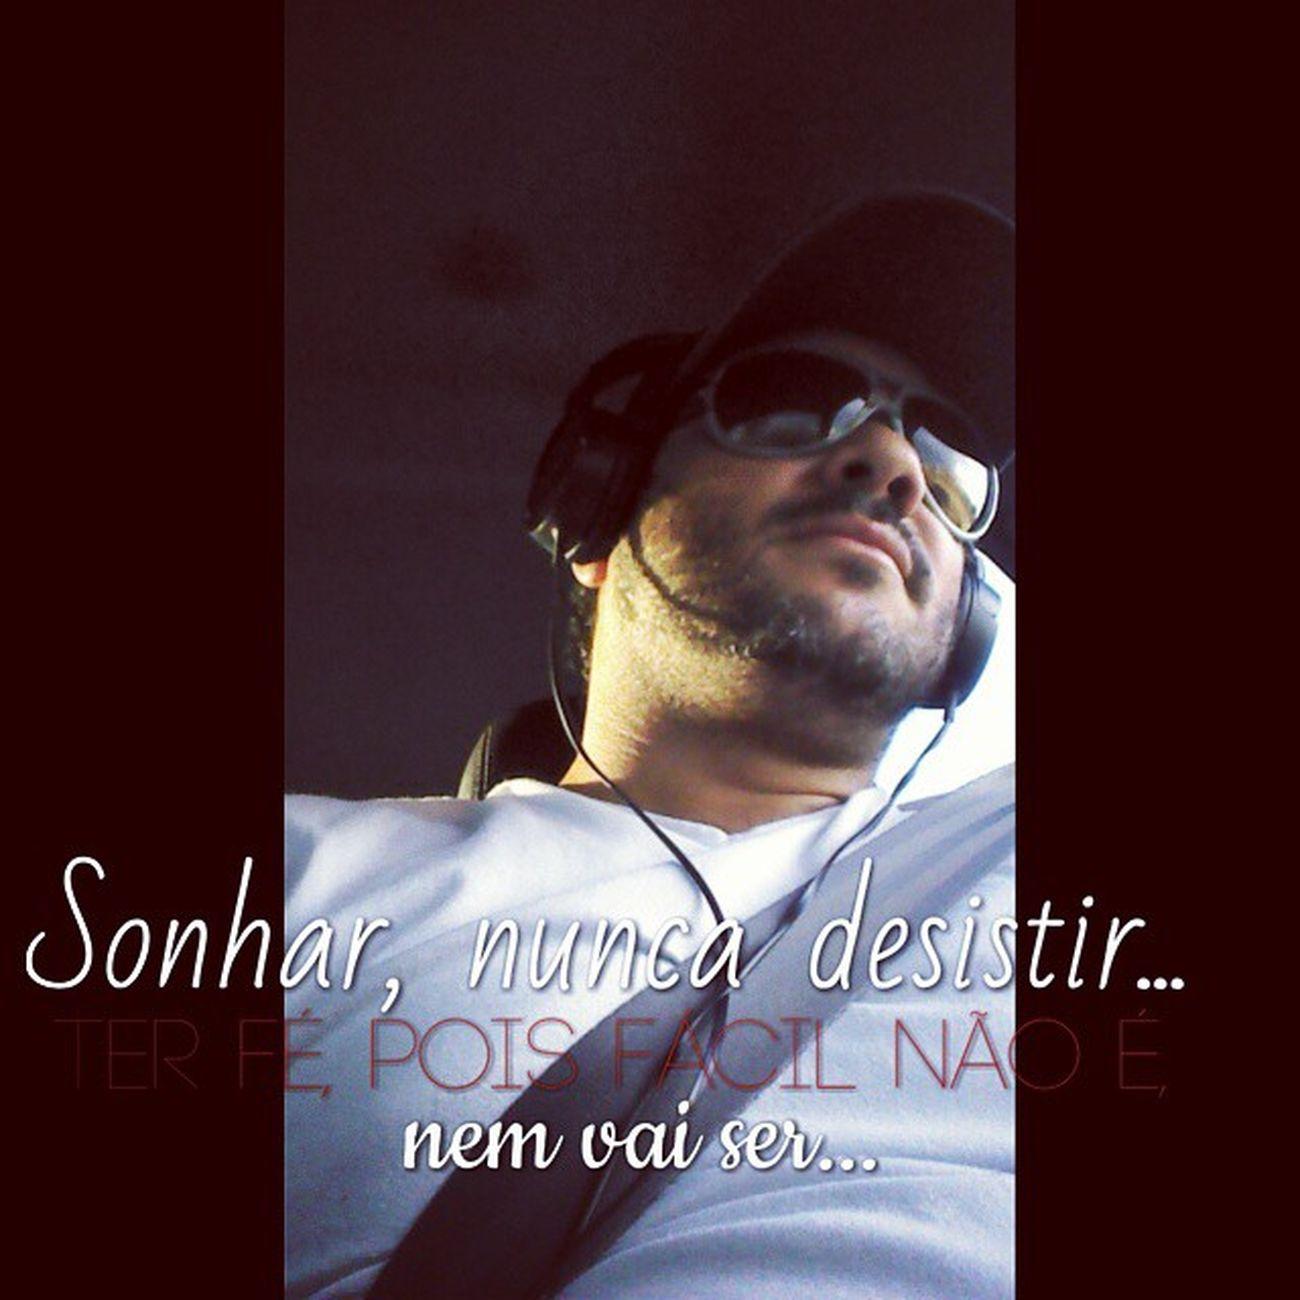 Sonhar